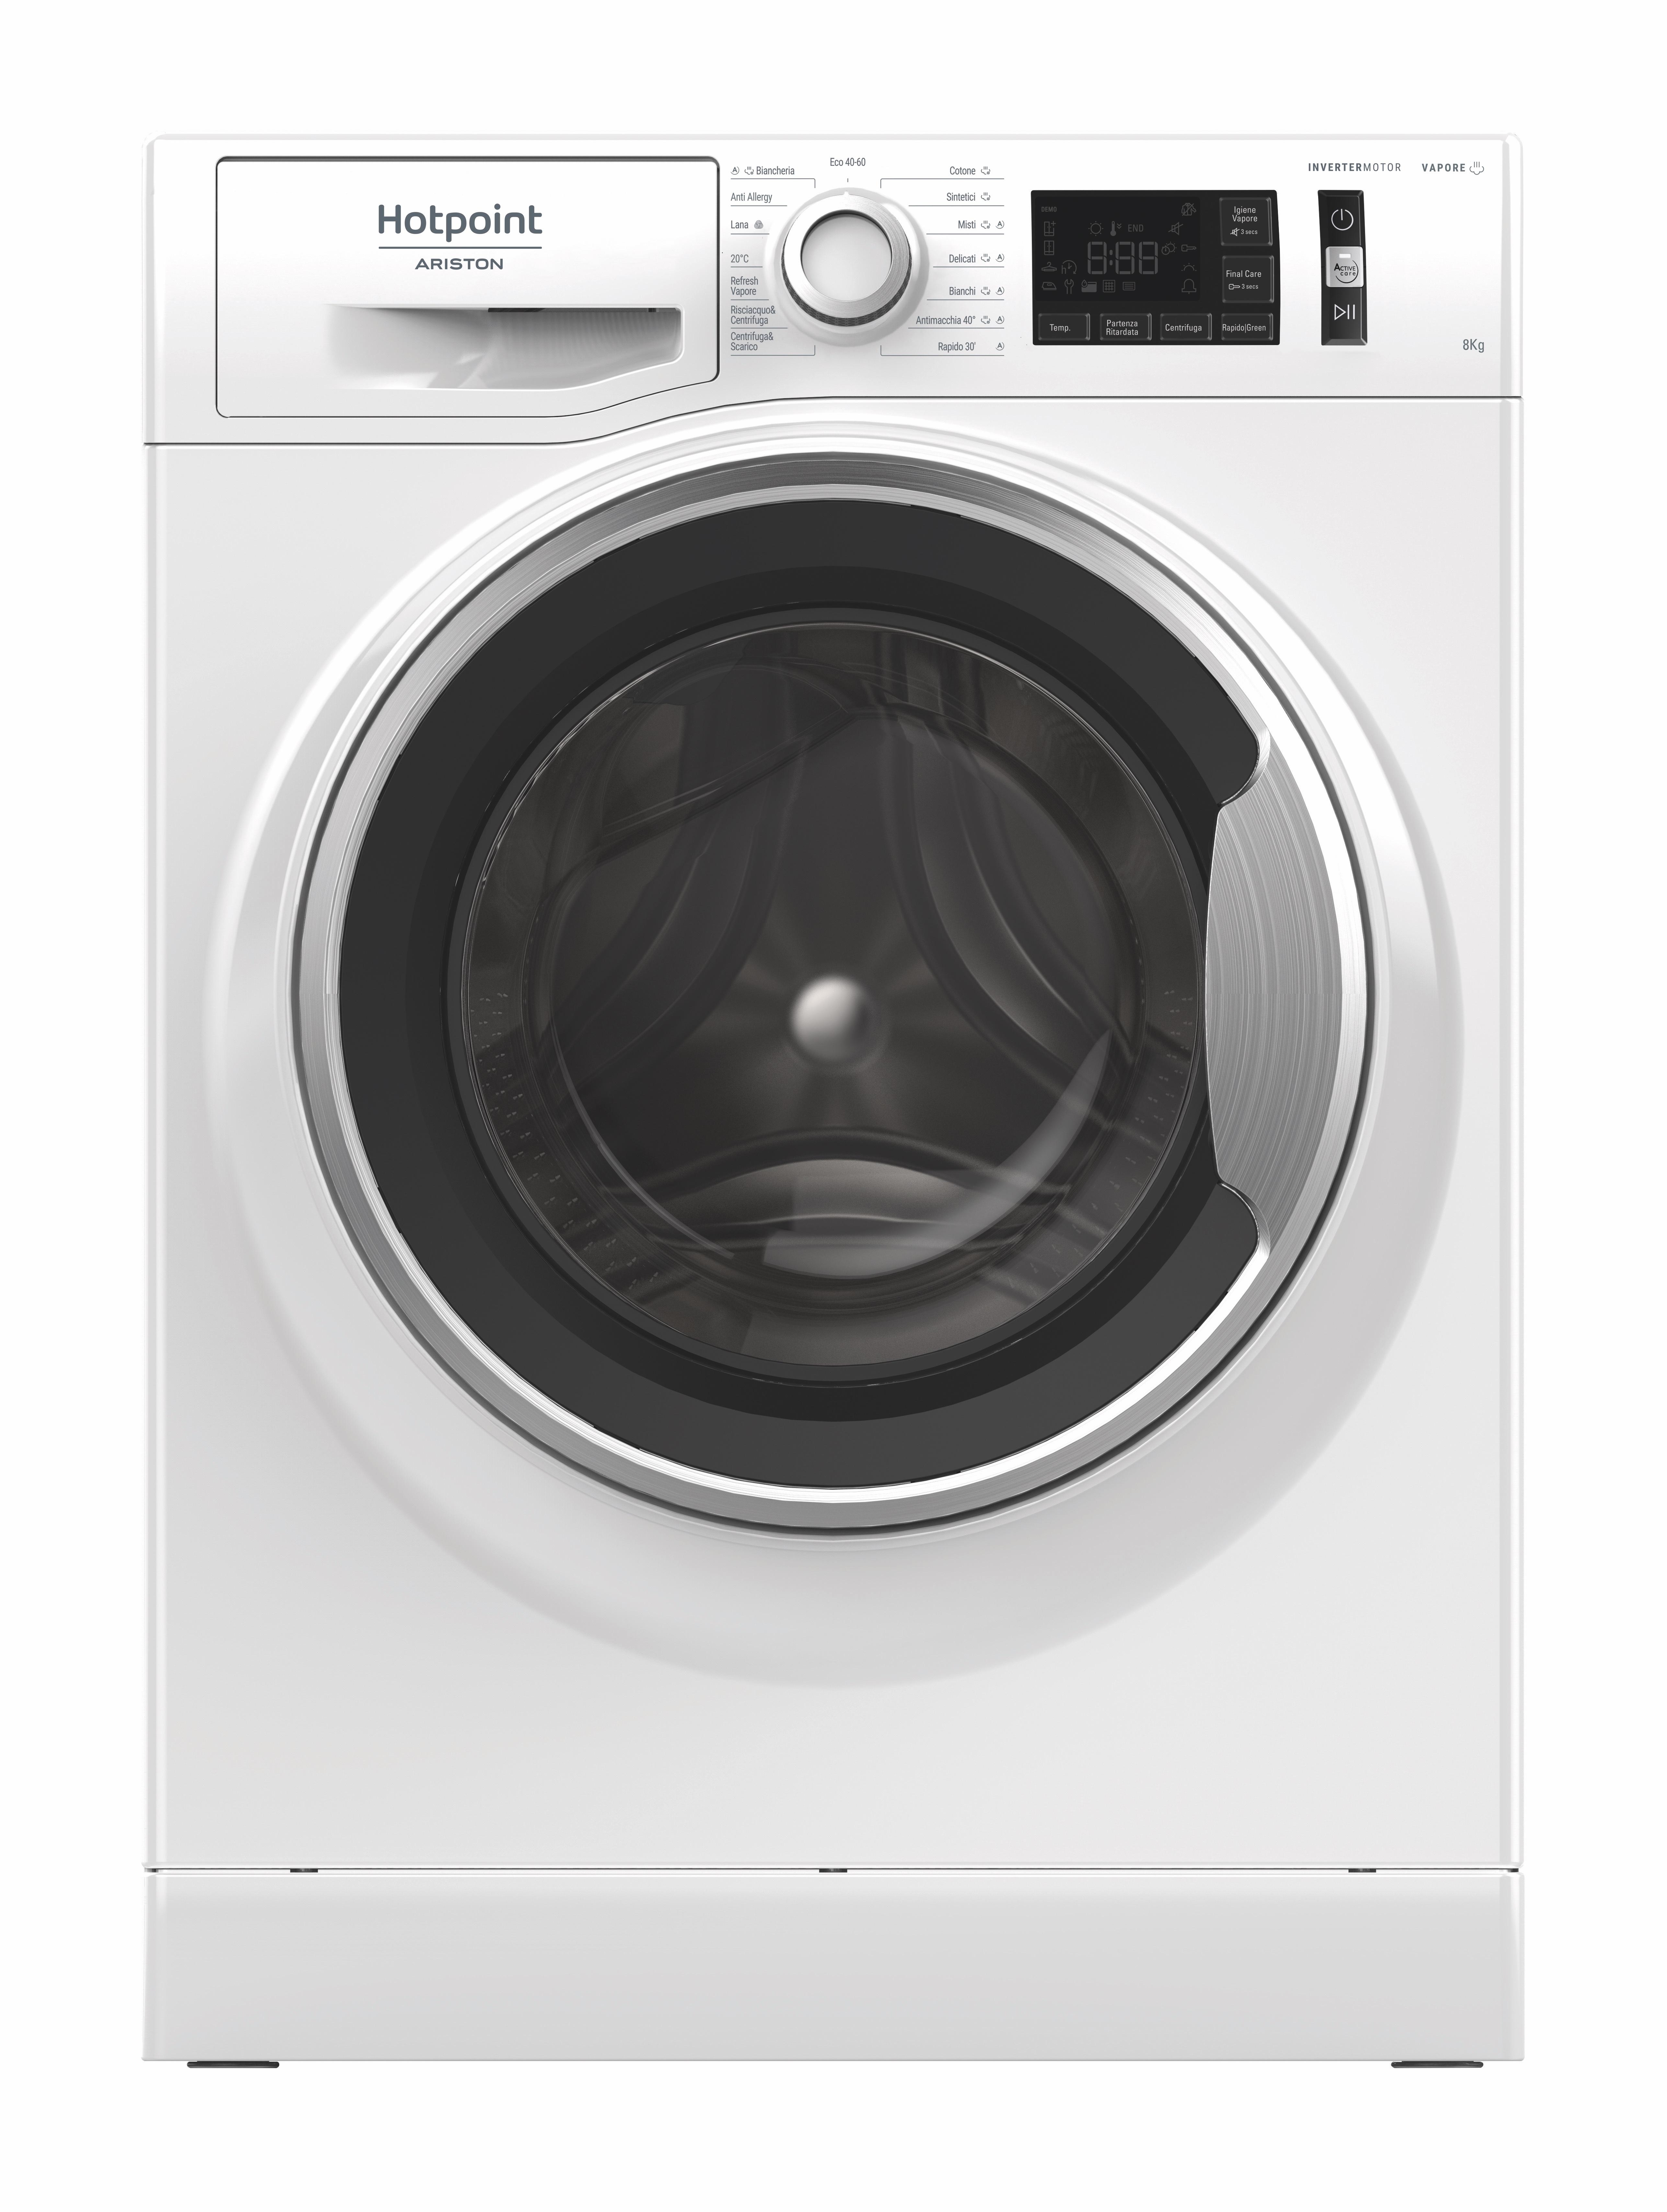 Hotpoint NR548GWSA IT N lavatrice Libera installazione Caricamento frontale 8 kg 1400 Giri/min B Bianco